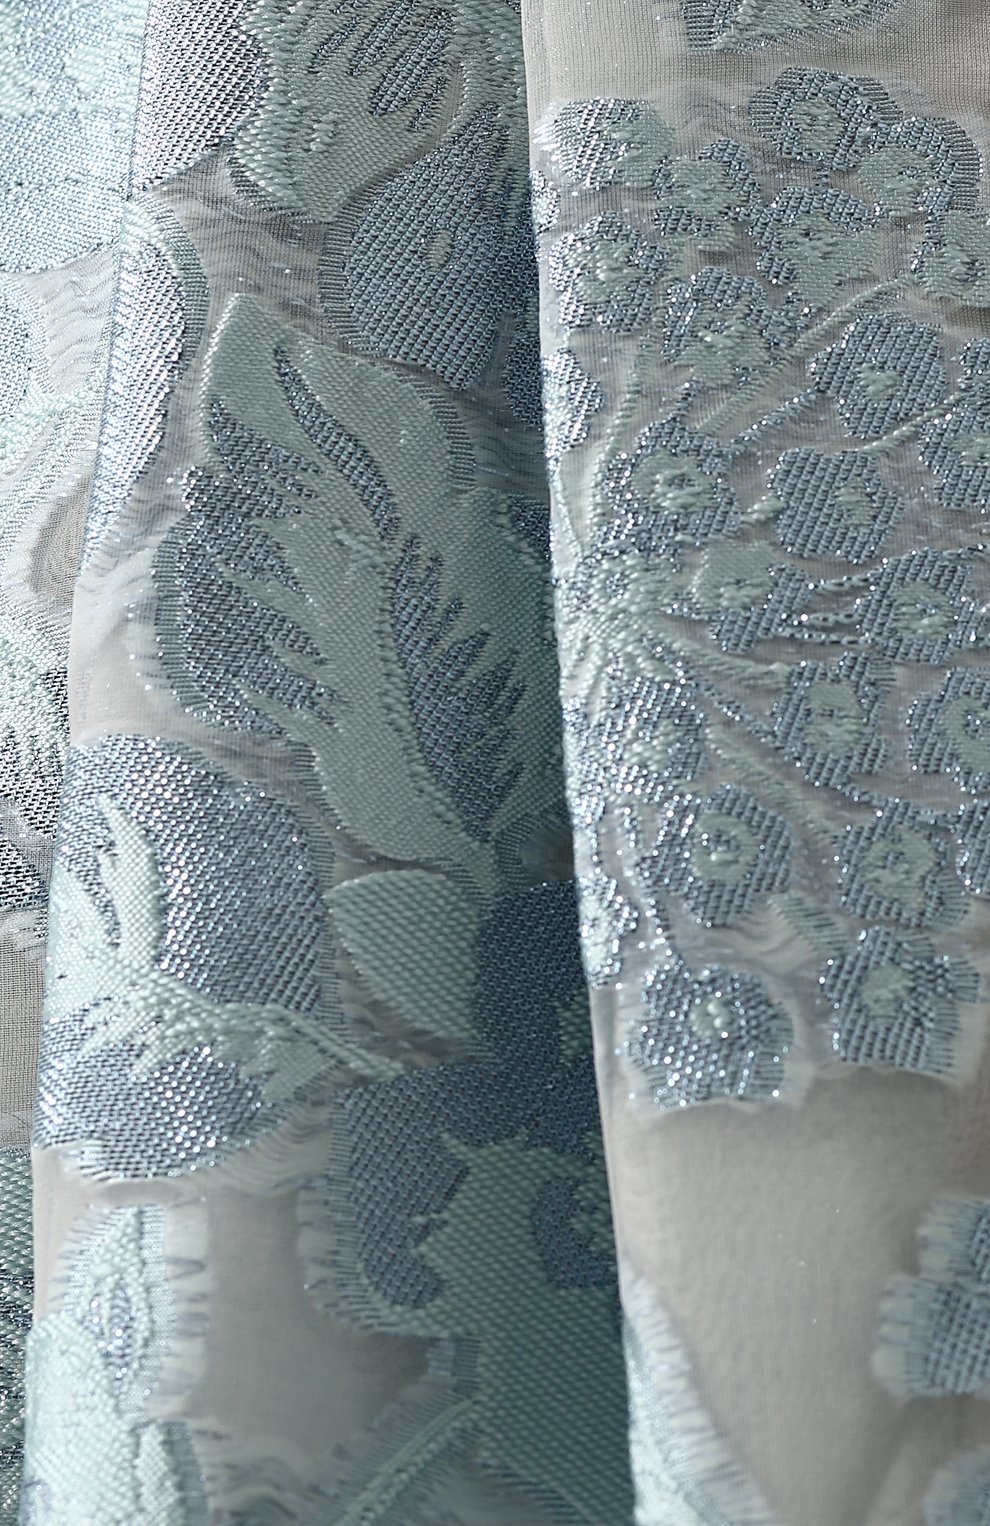 Юбка-макси с защипами и цветочной отделкой St. John светло-зеленая | Фото №5